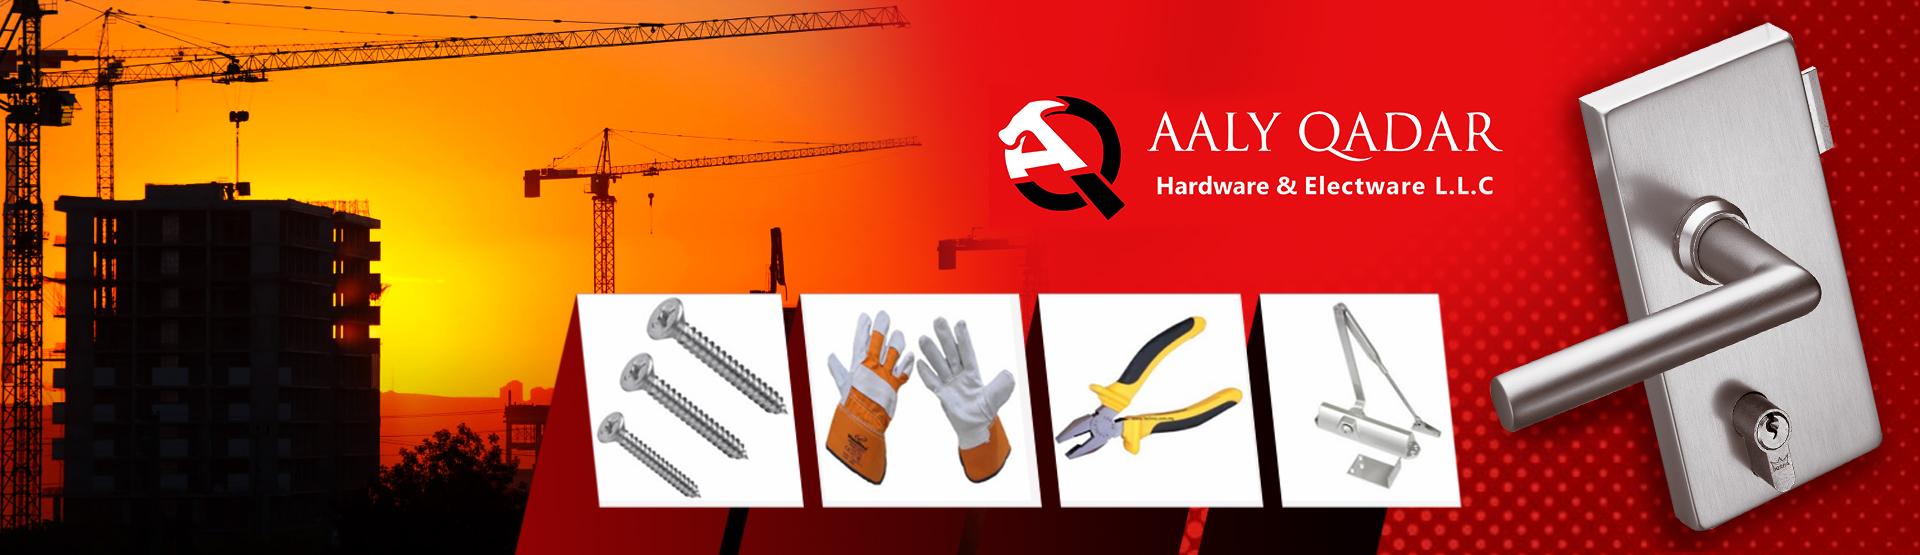 AALY QADAR HARDWARE & ELECTRICWARE LLC